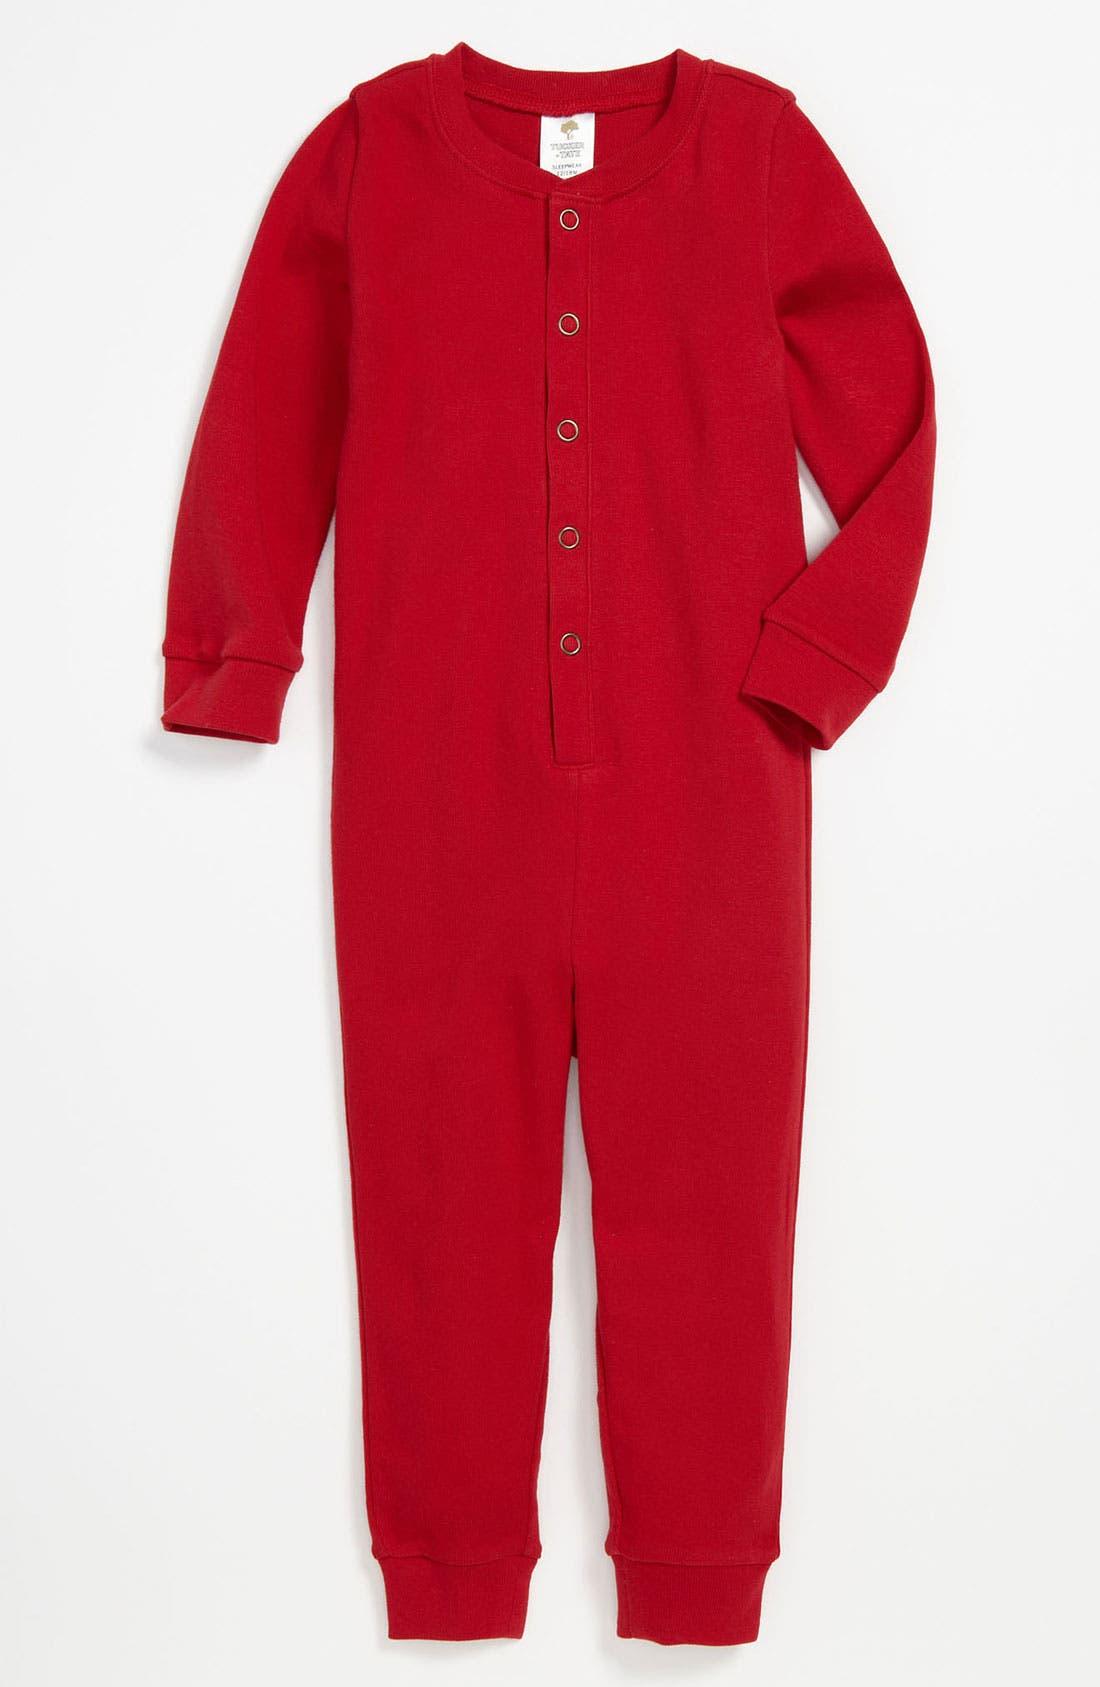 Alternate Image 1 Selected - Tucker + Tate Union Suit Pajamas (Infant)